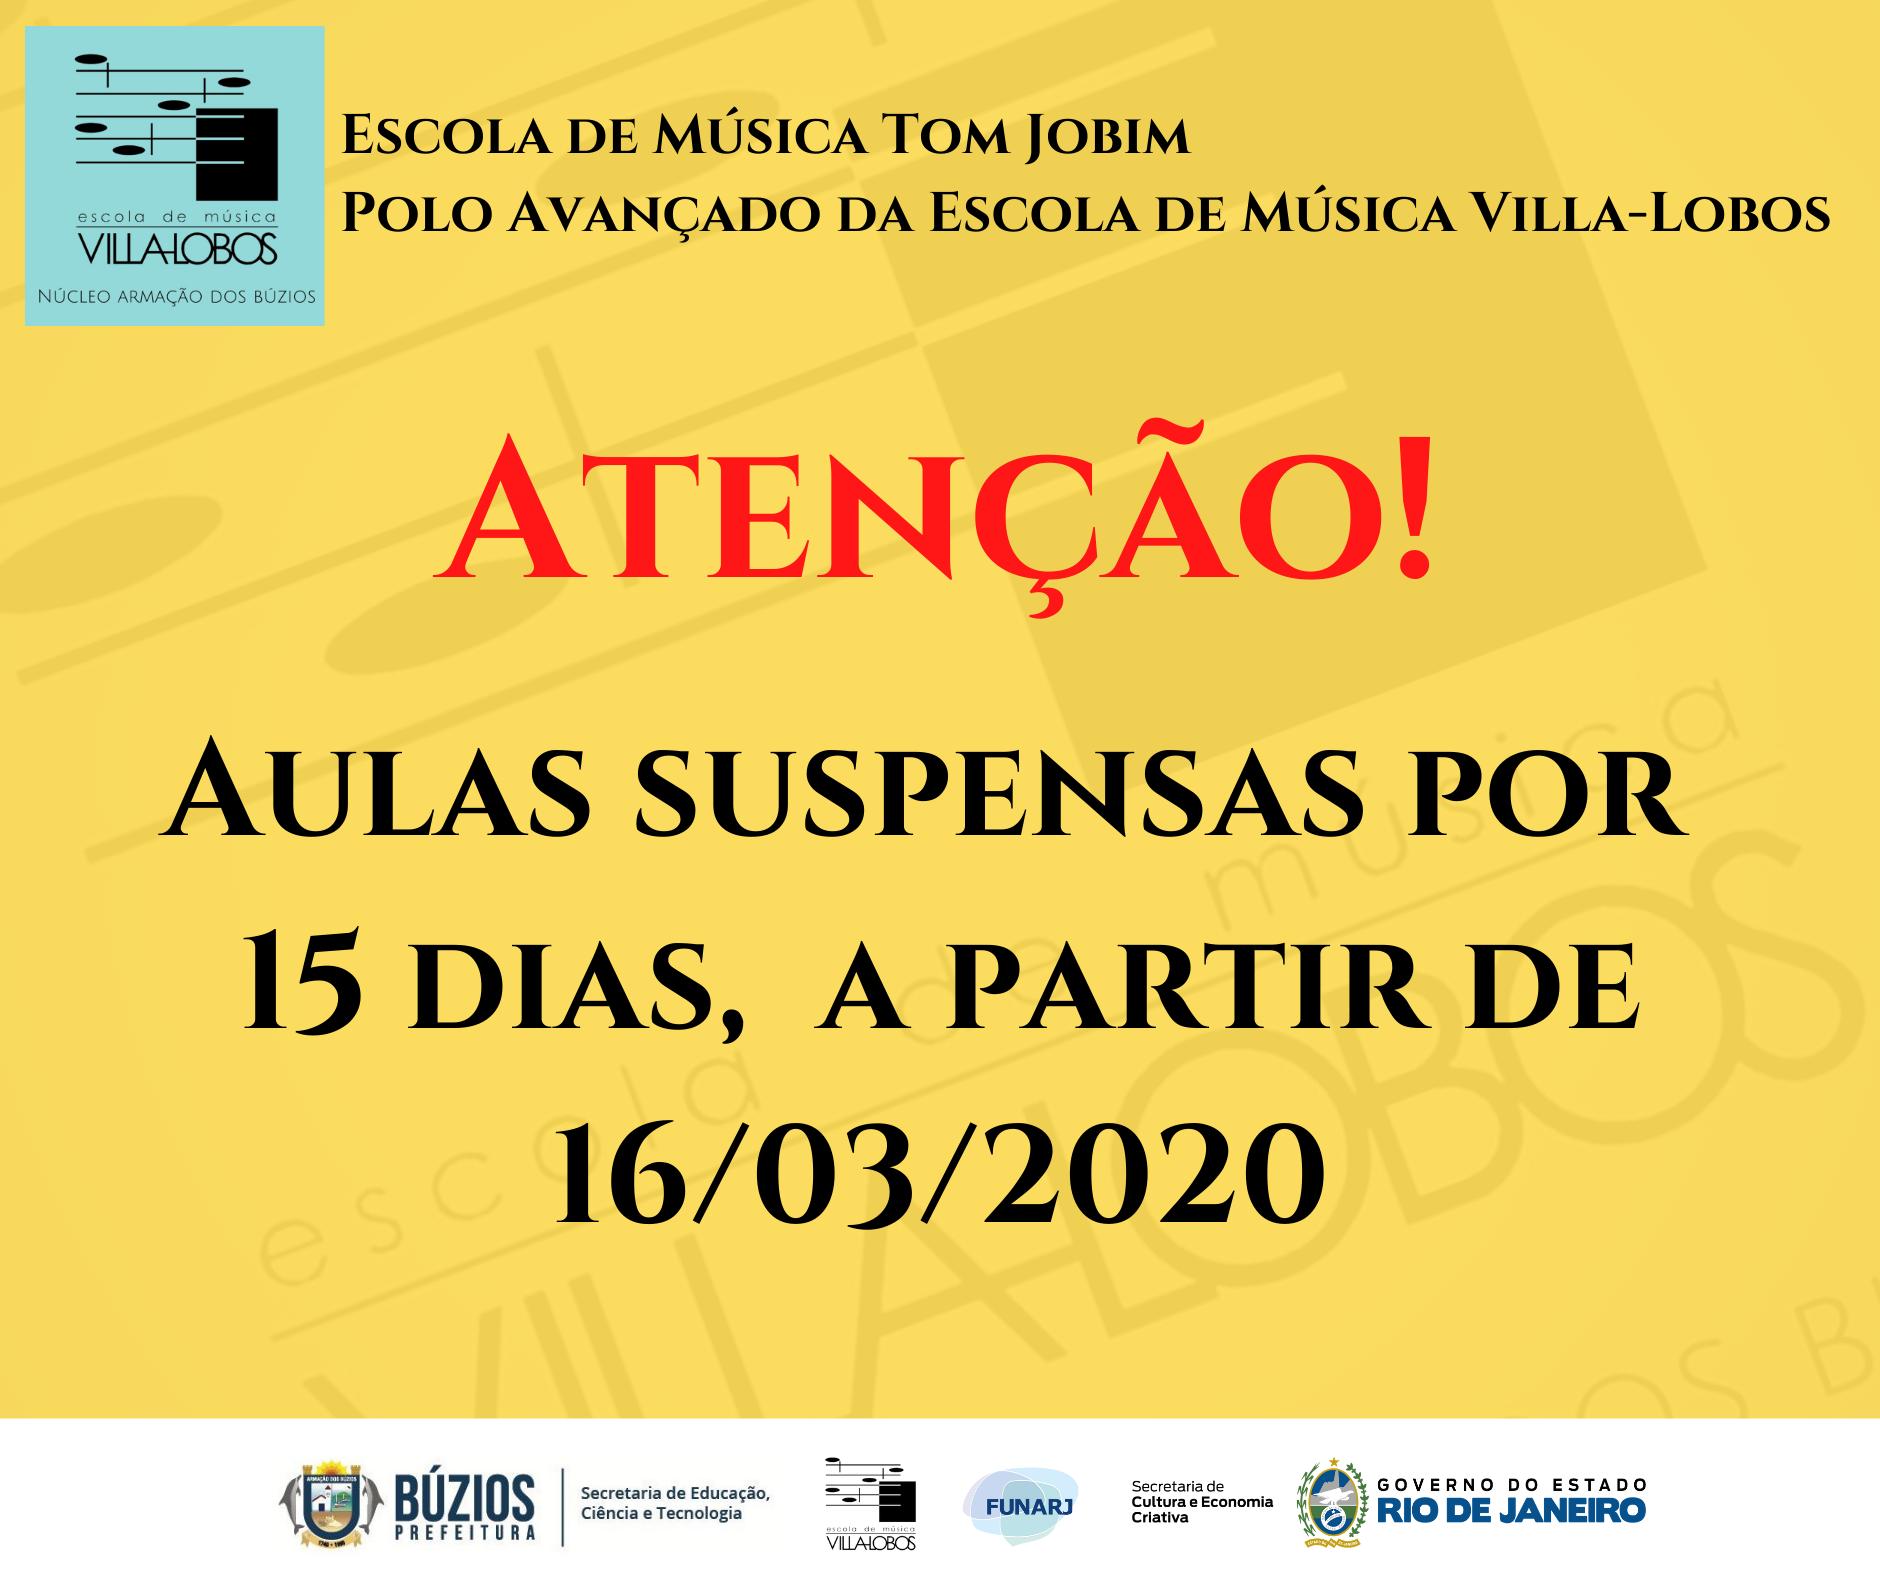 059BAD42-A356-4DB9-9887-42415C58B225